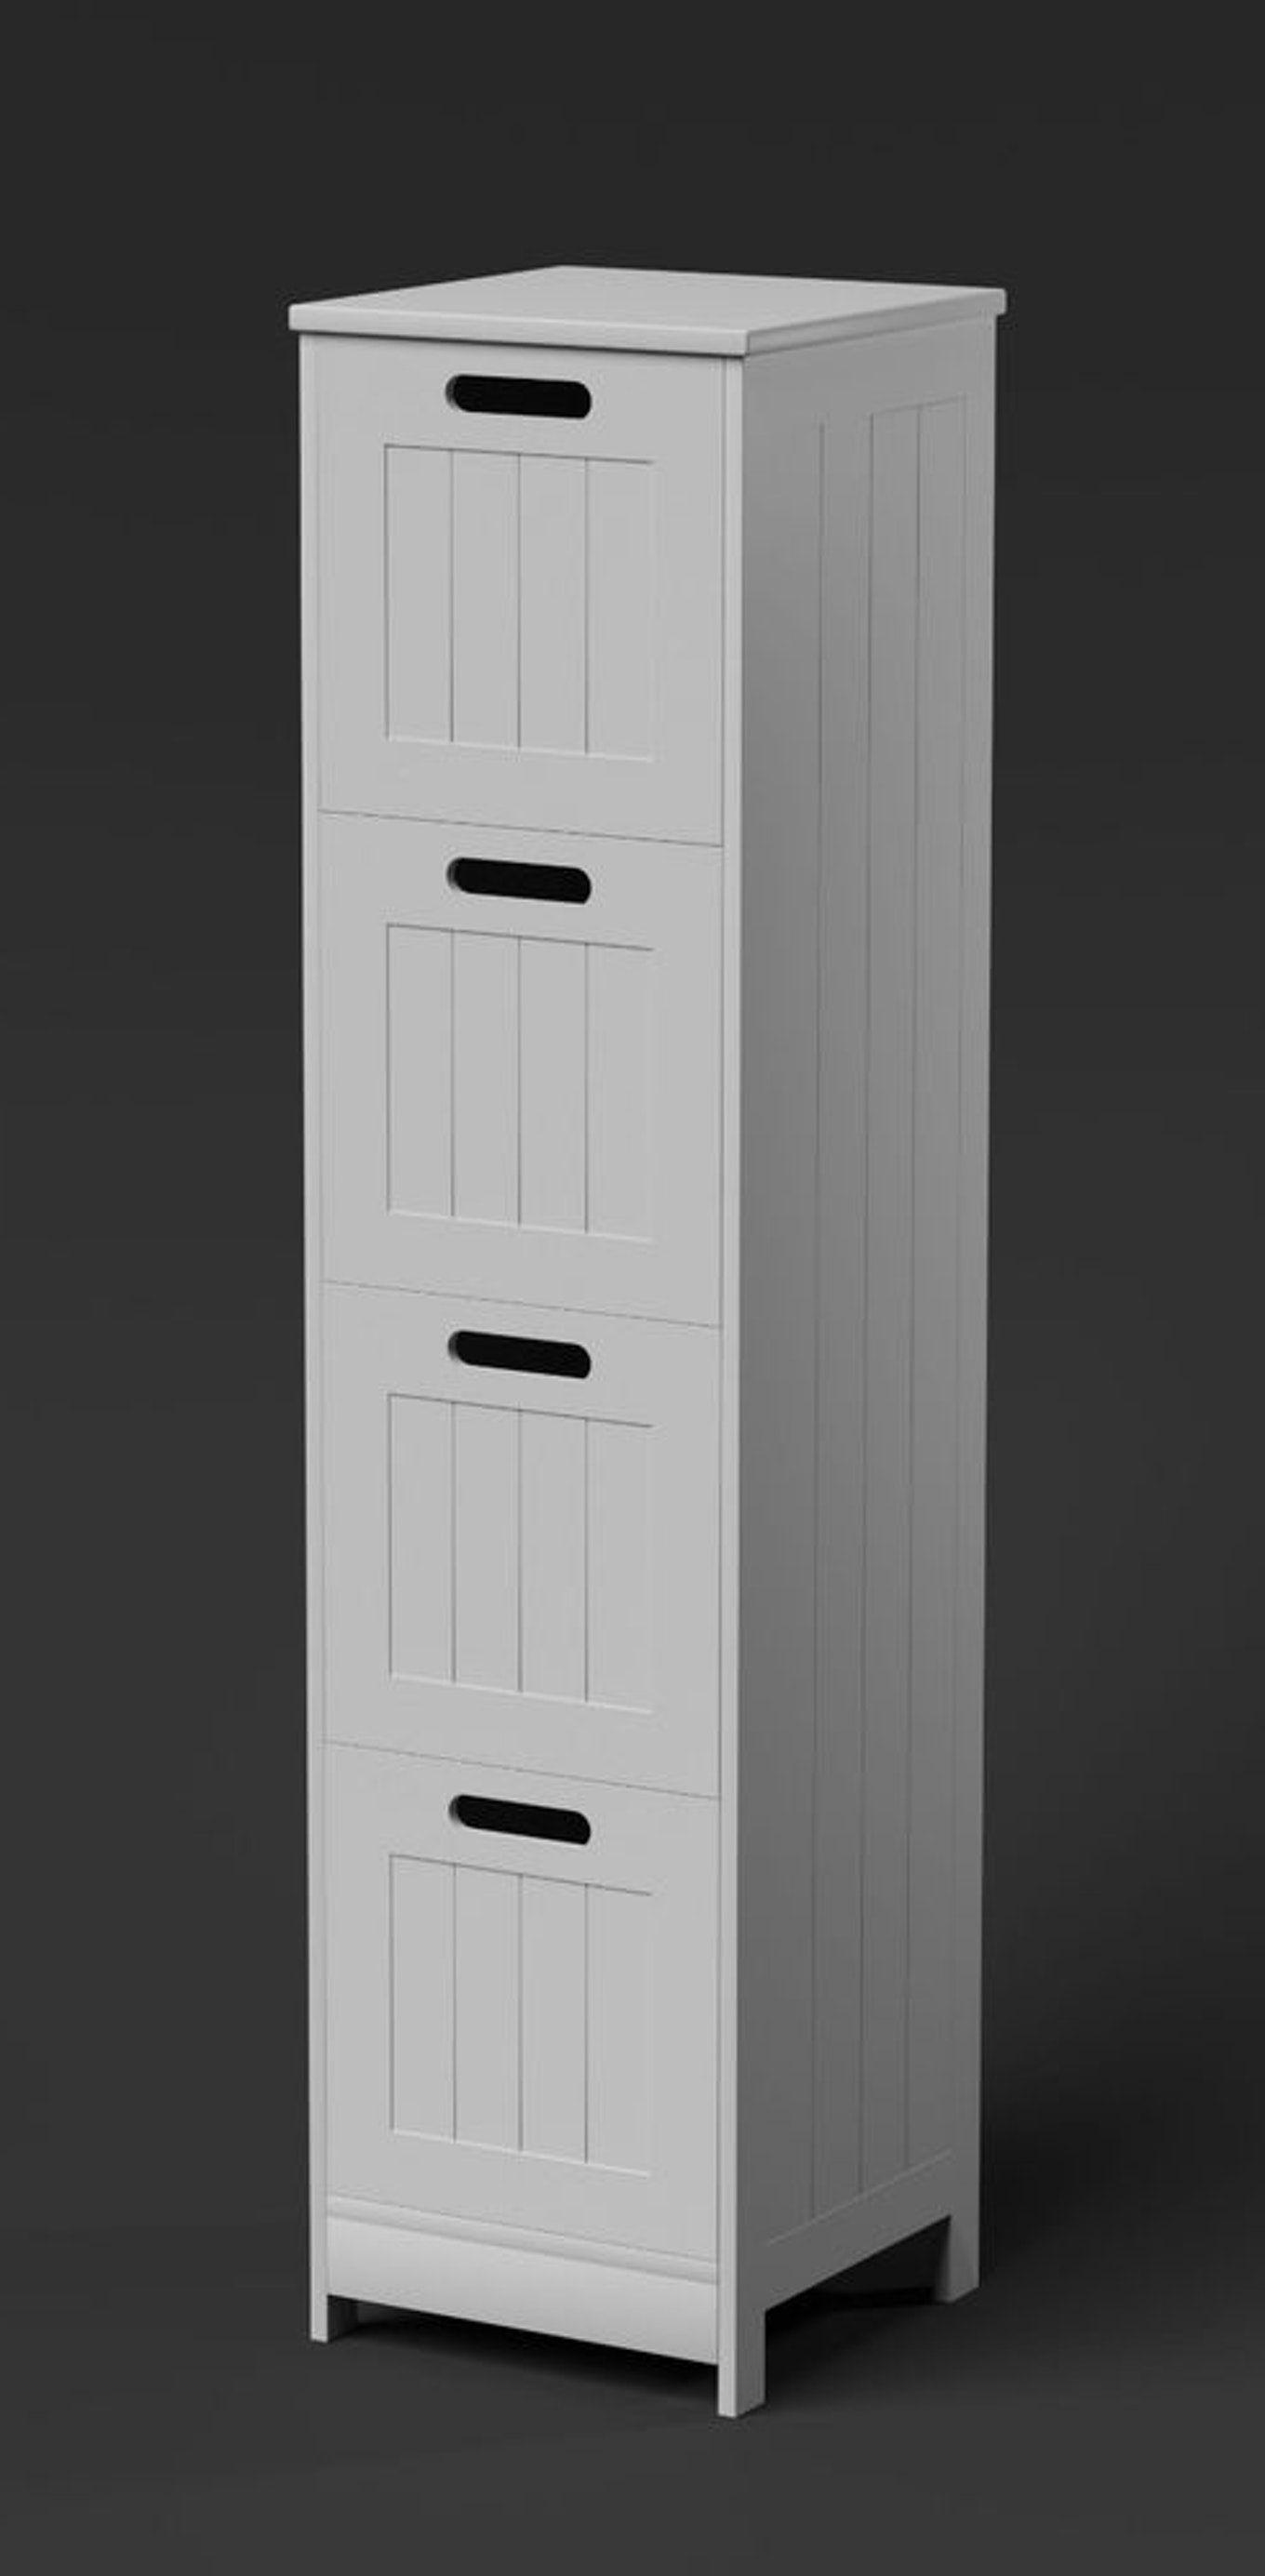 Tall Shallow Bathroom Cabinets | Bathroom Ideas | Pinterest ...